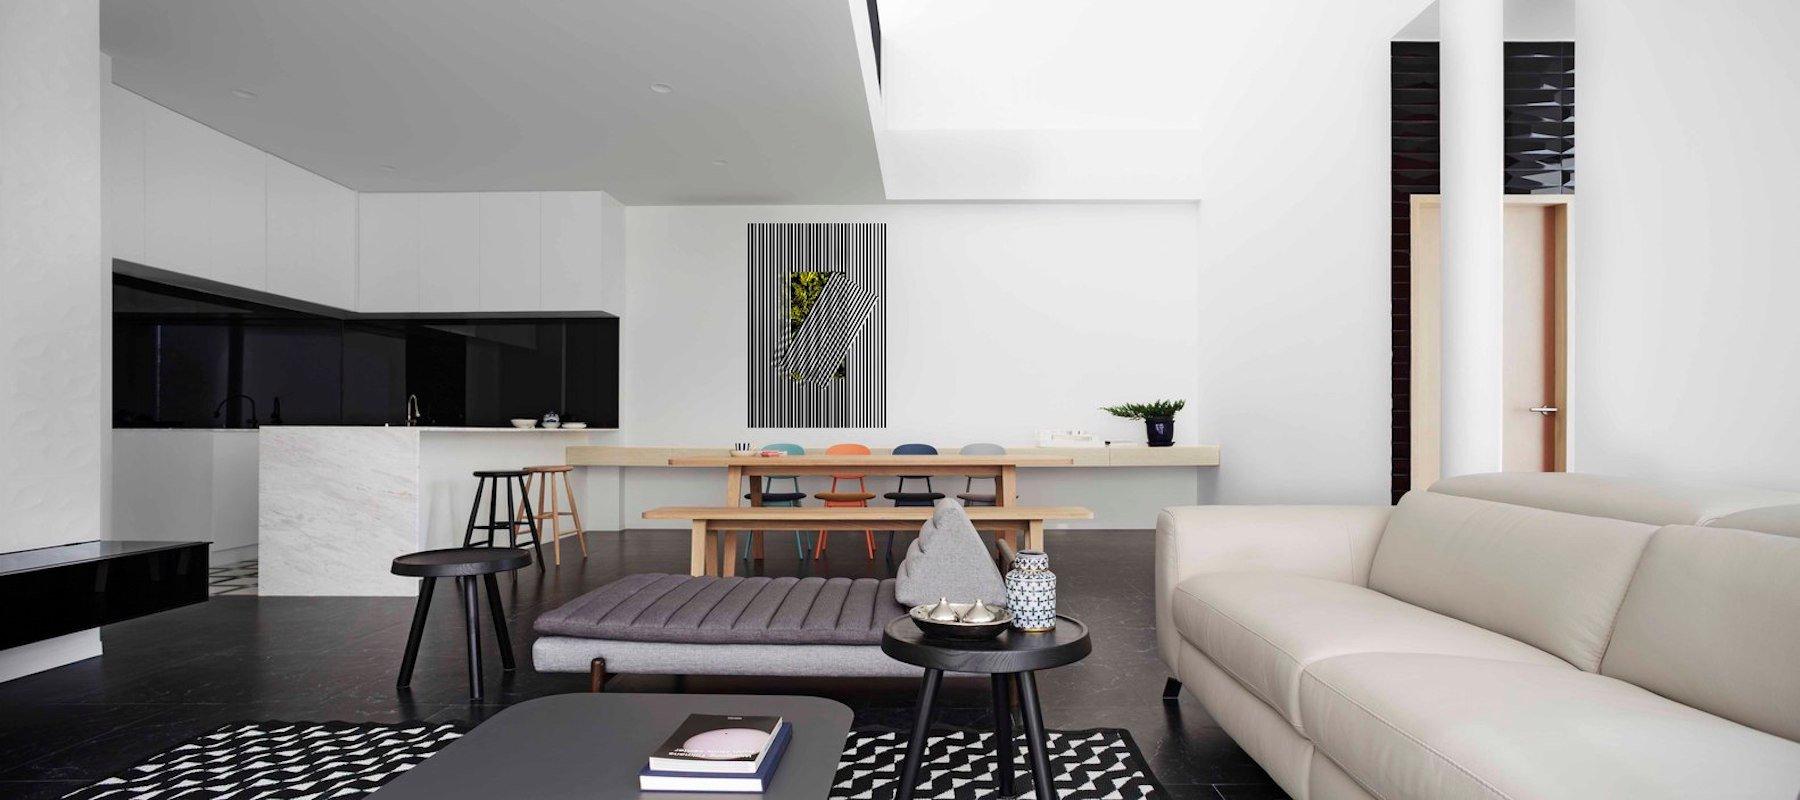 iGNANT-Architecture-Ayutt-And-Associates-Design-White-Box-House-21